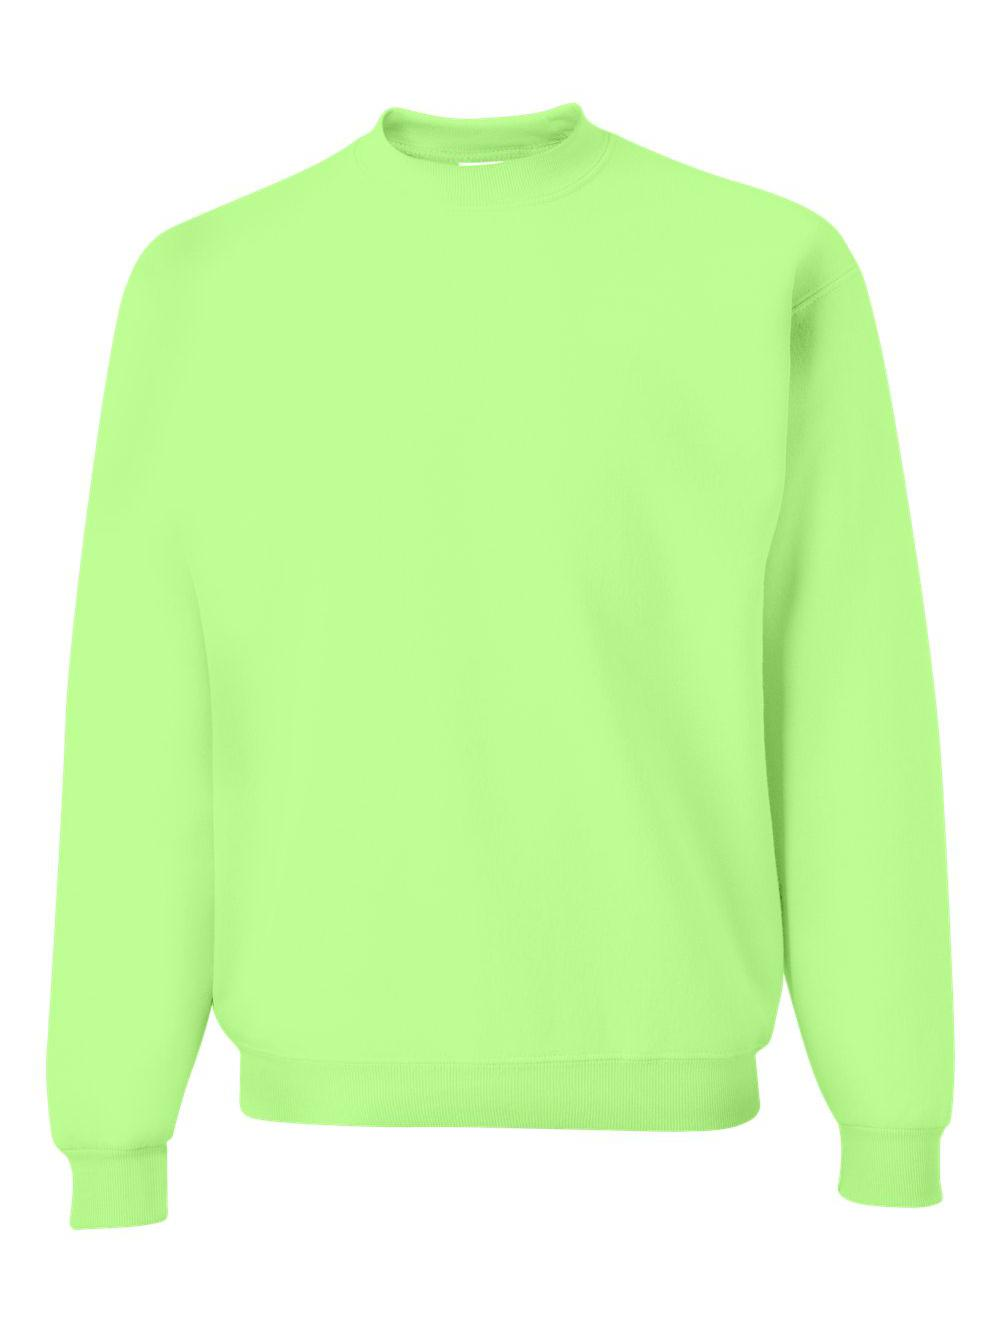 Jerzees-NuBlend-Crewneck-Sweatshirt-562MR thumbnail 60